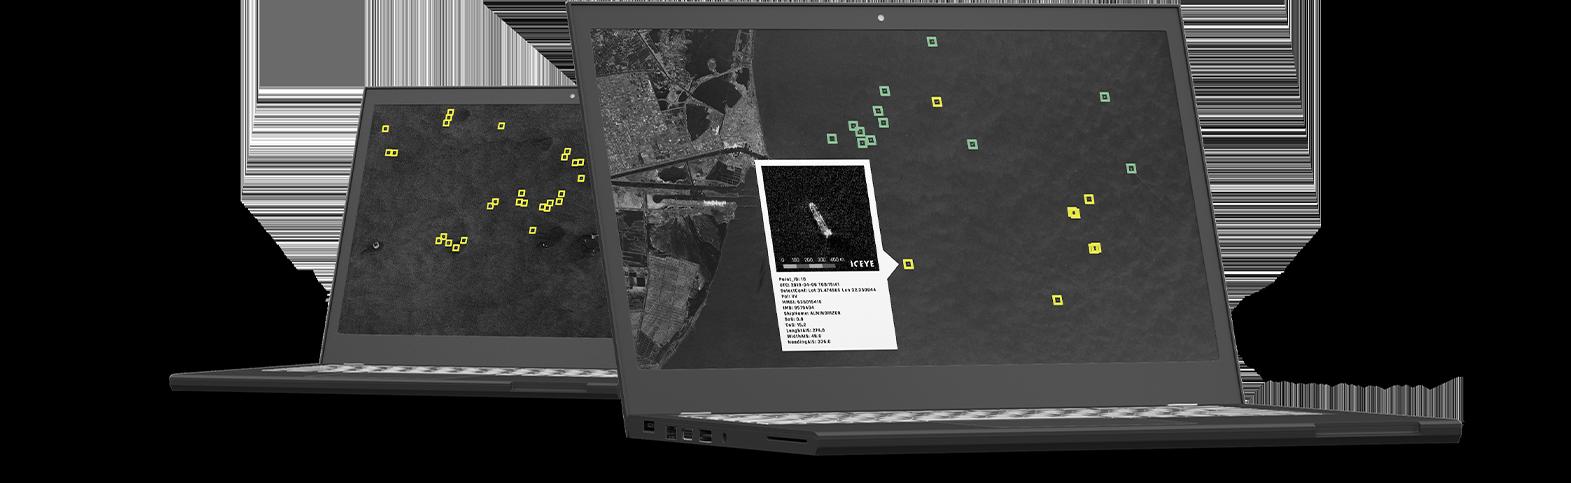 Dark Vessel Detection Dataset